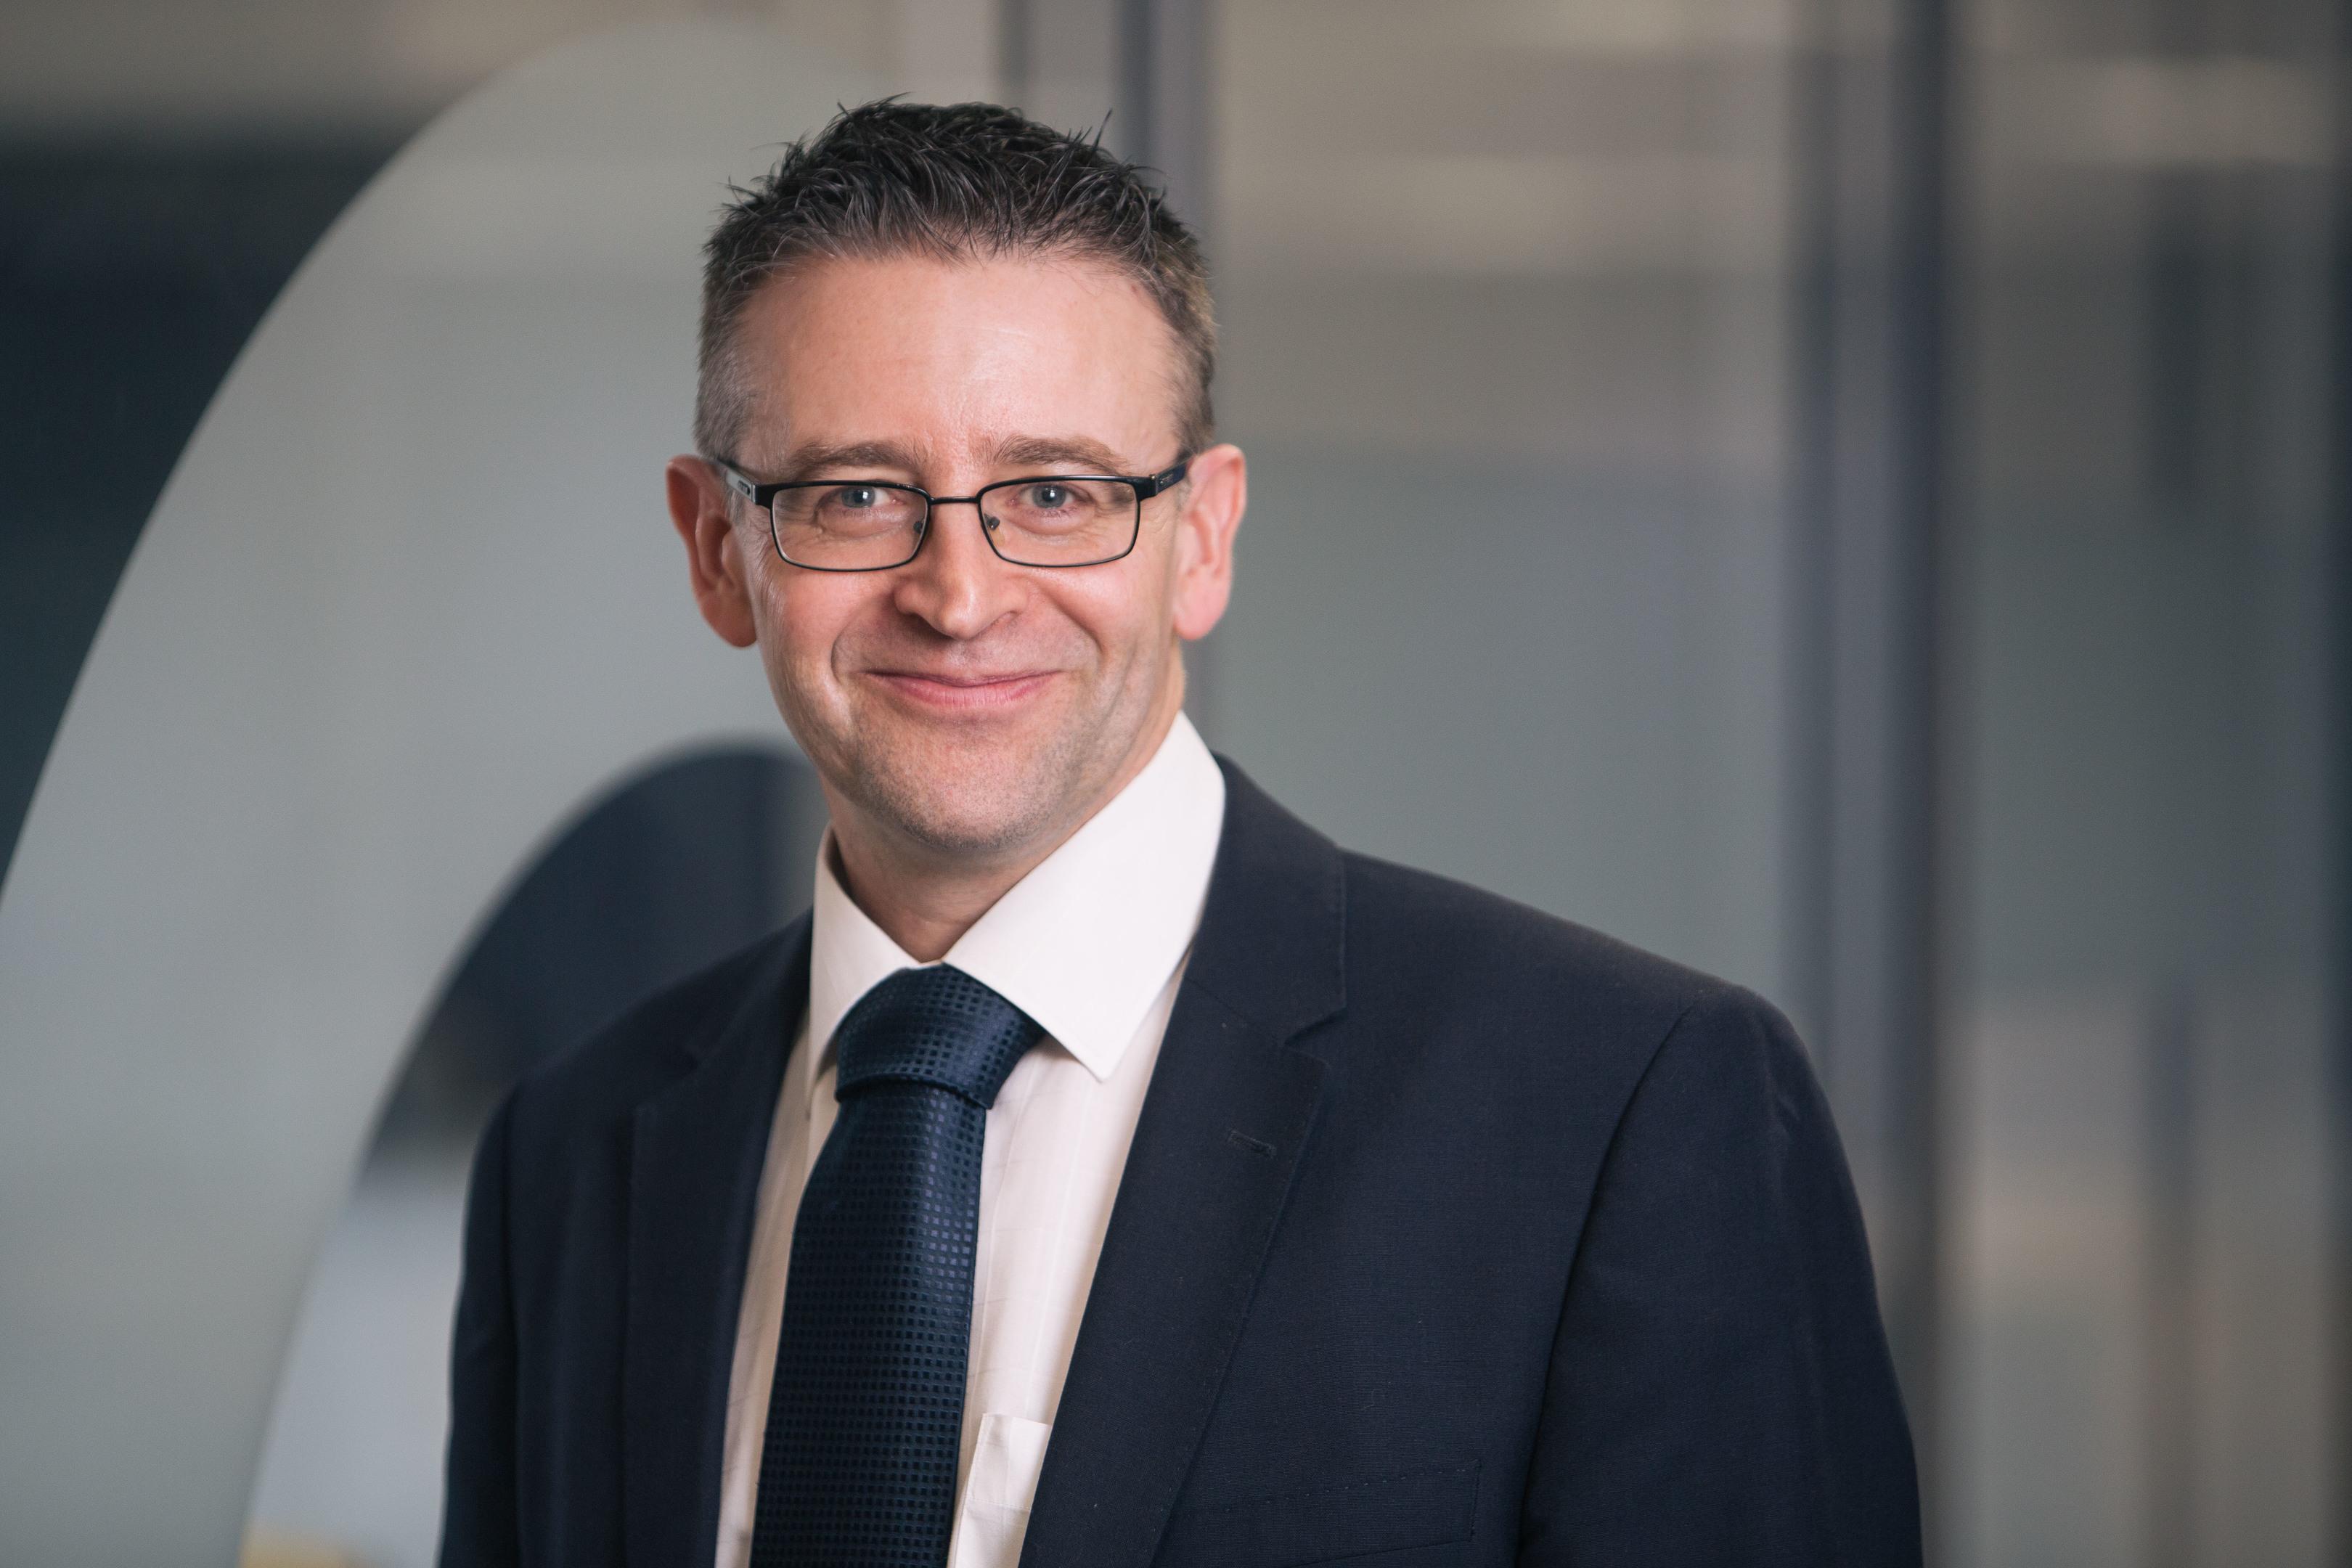 Steven Plant, managing director of PIM